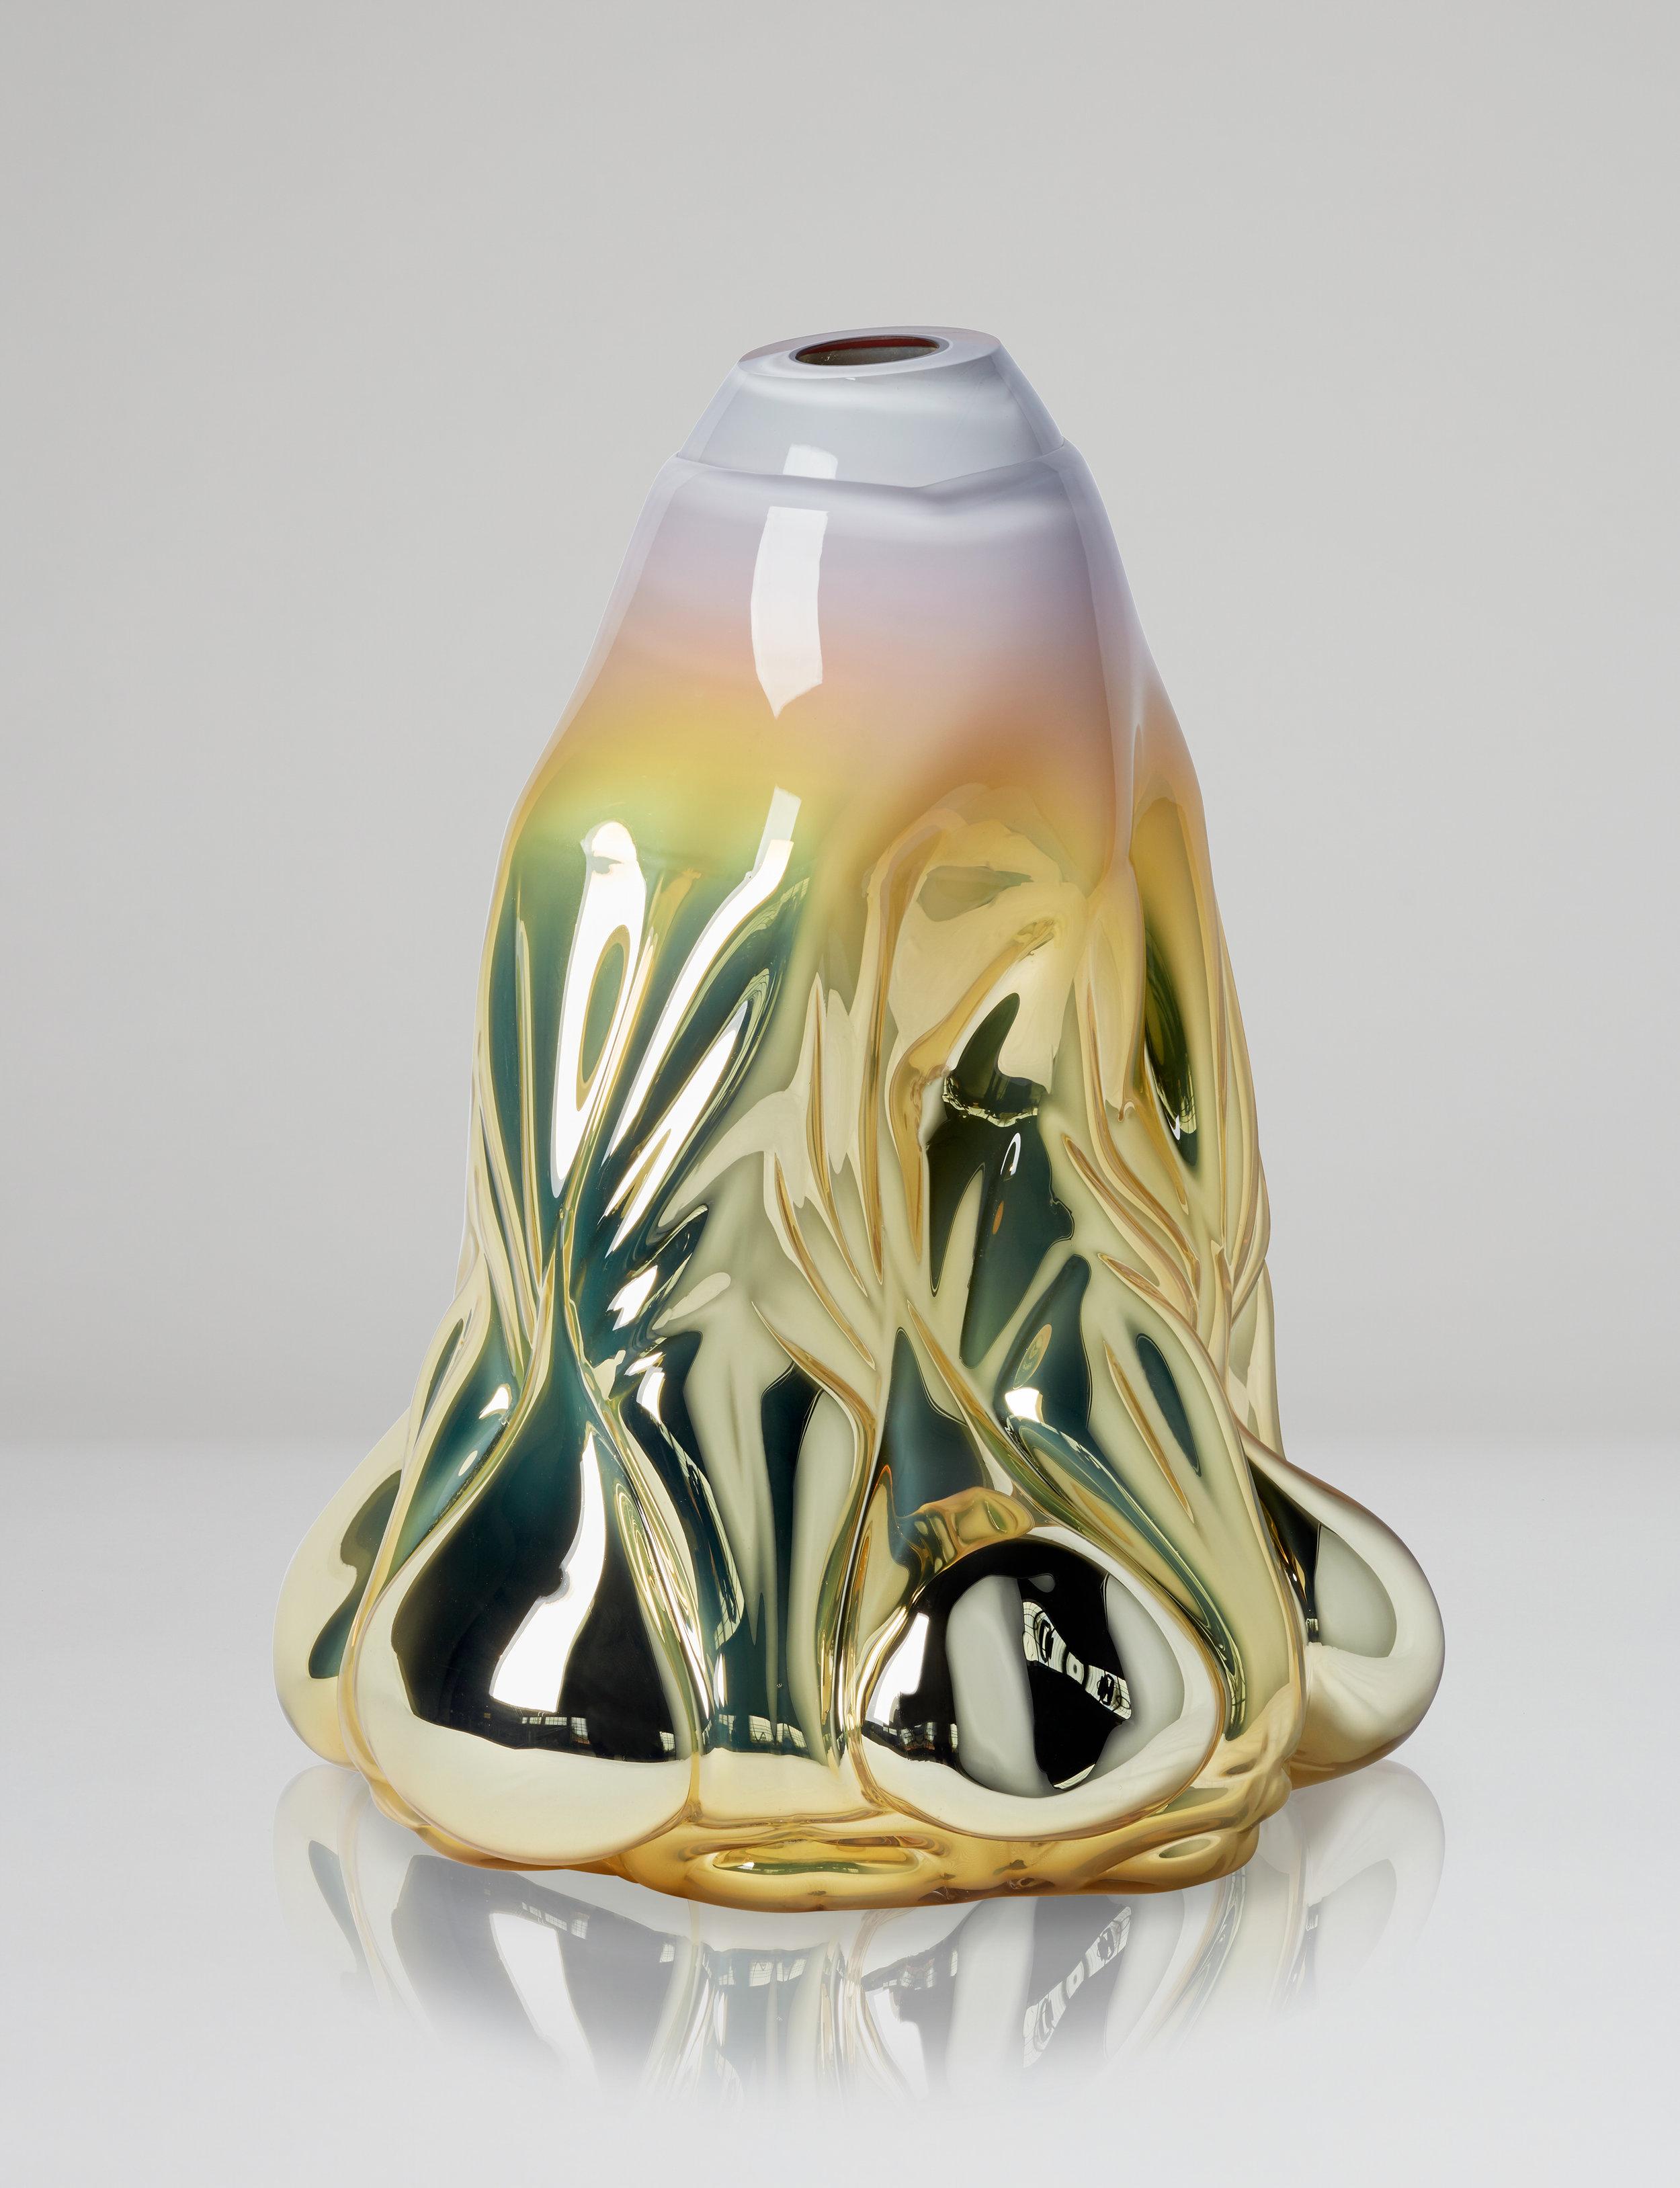 Dripping Print, soft yellow metallic. 2018. Boda Glasbruk. Shape-blown glass, mirror foiled. 50 cm x 37 cm. Edition 1 + 2 AP